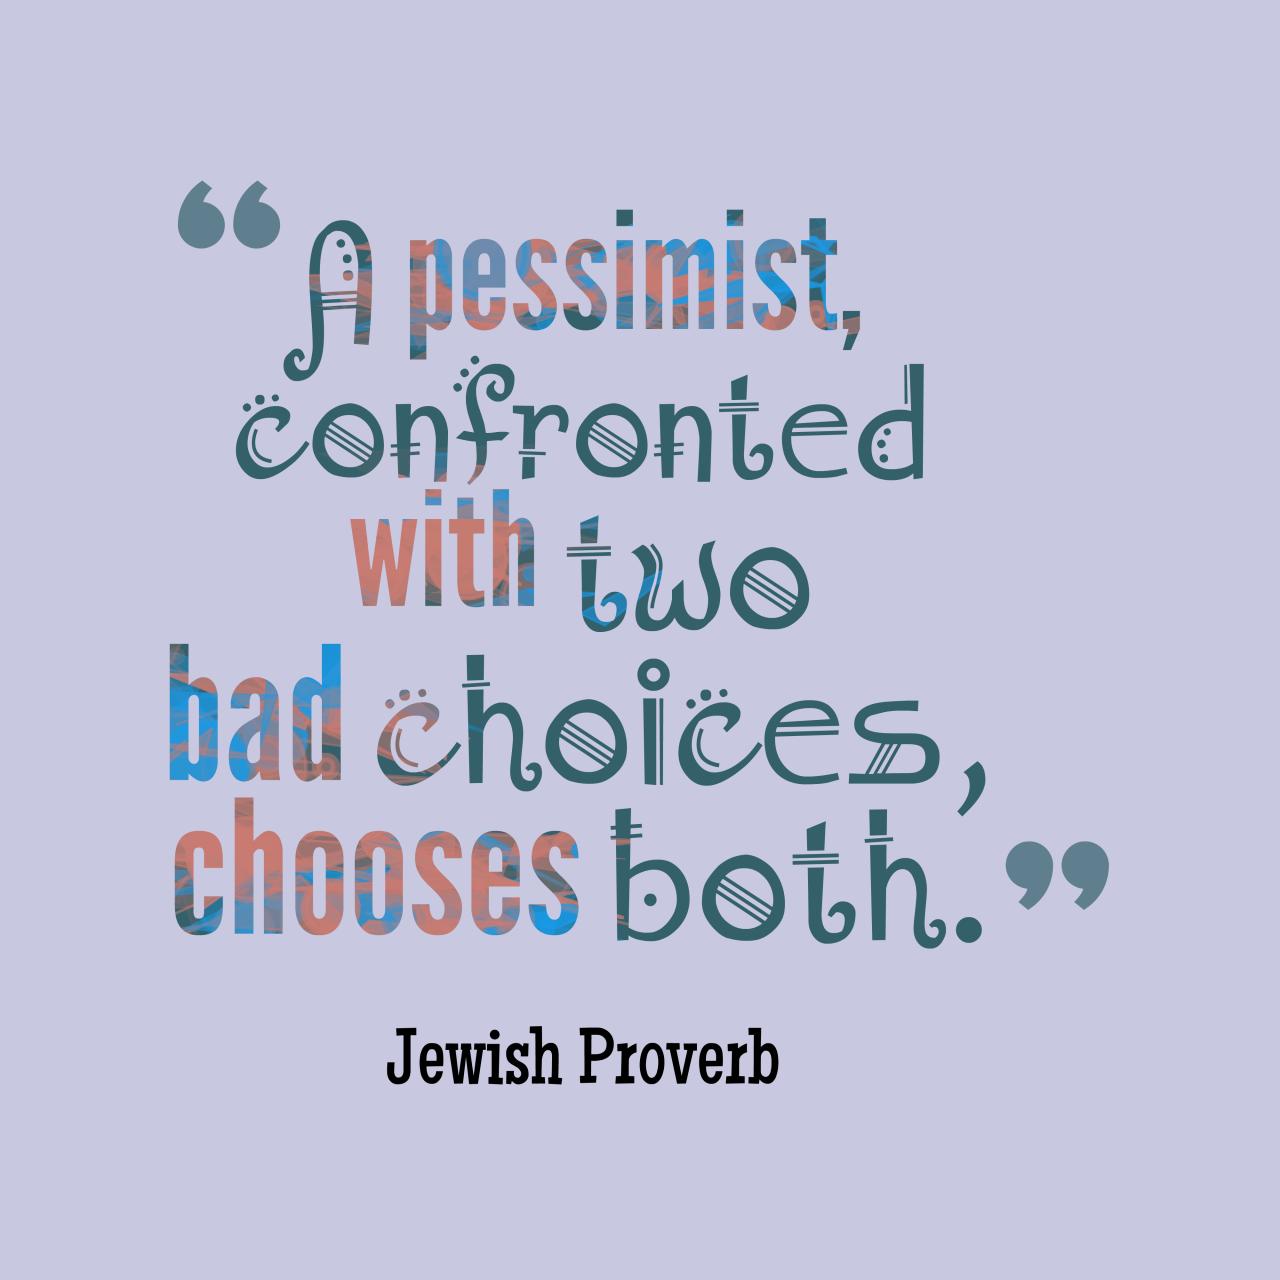 A Pessimist Confronted